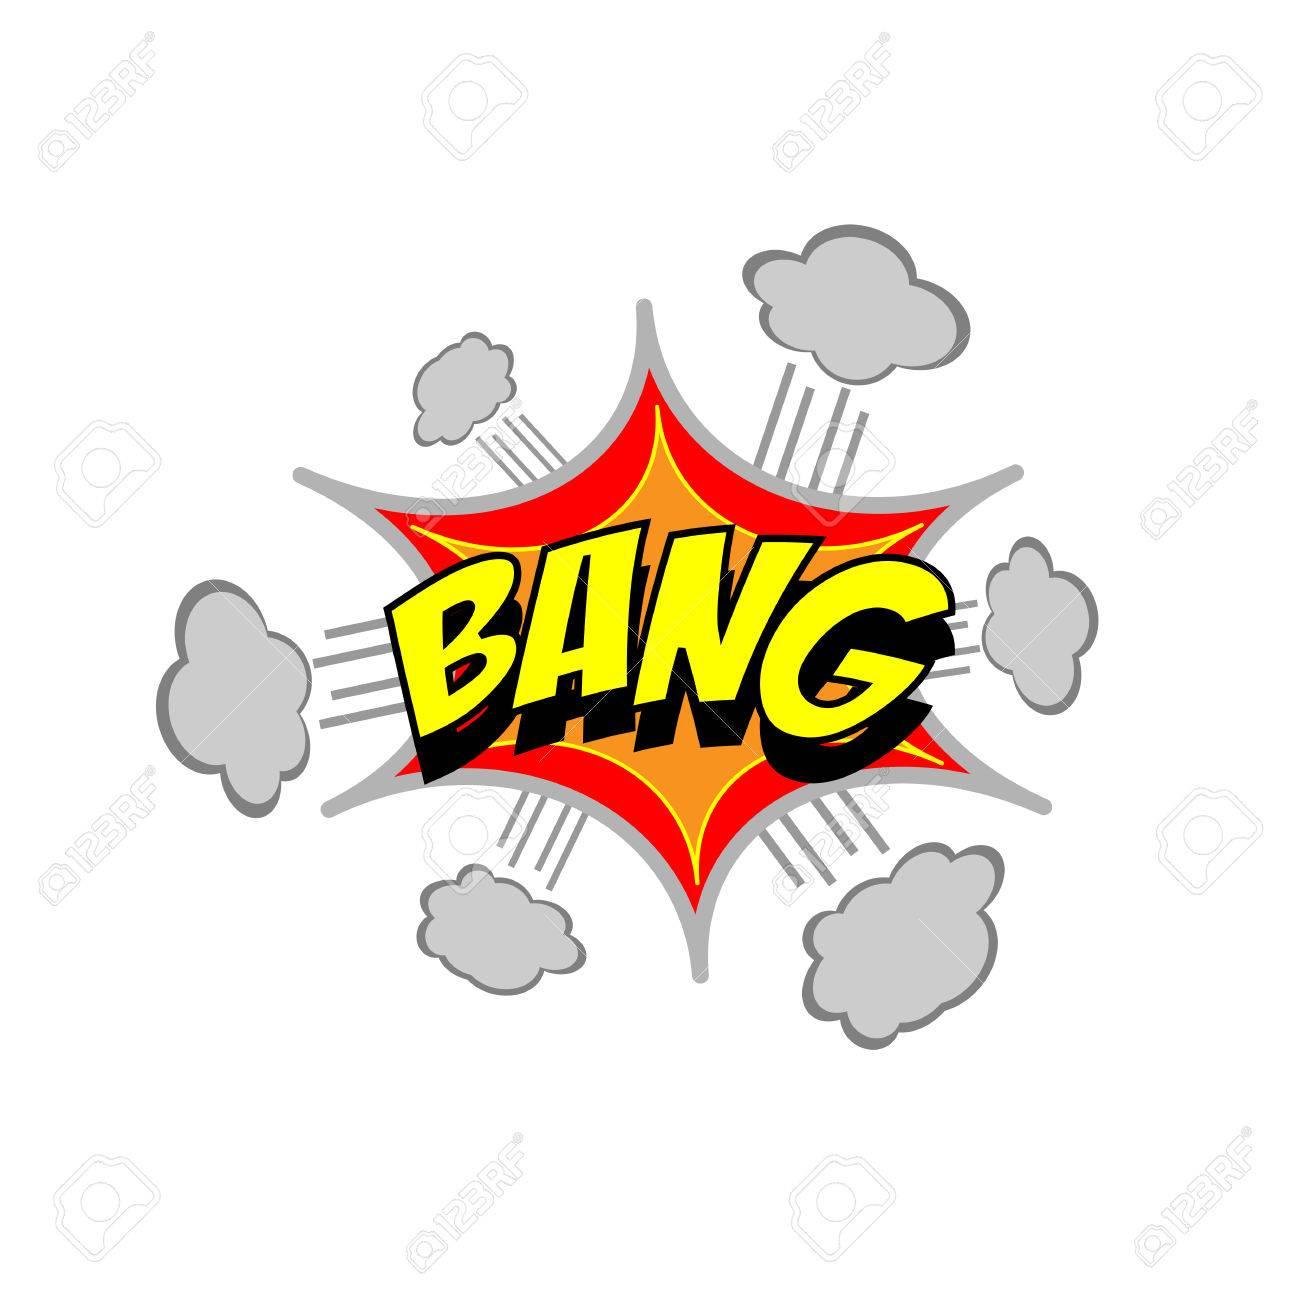 Bang com free